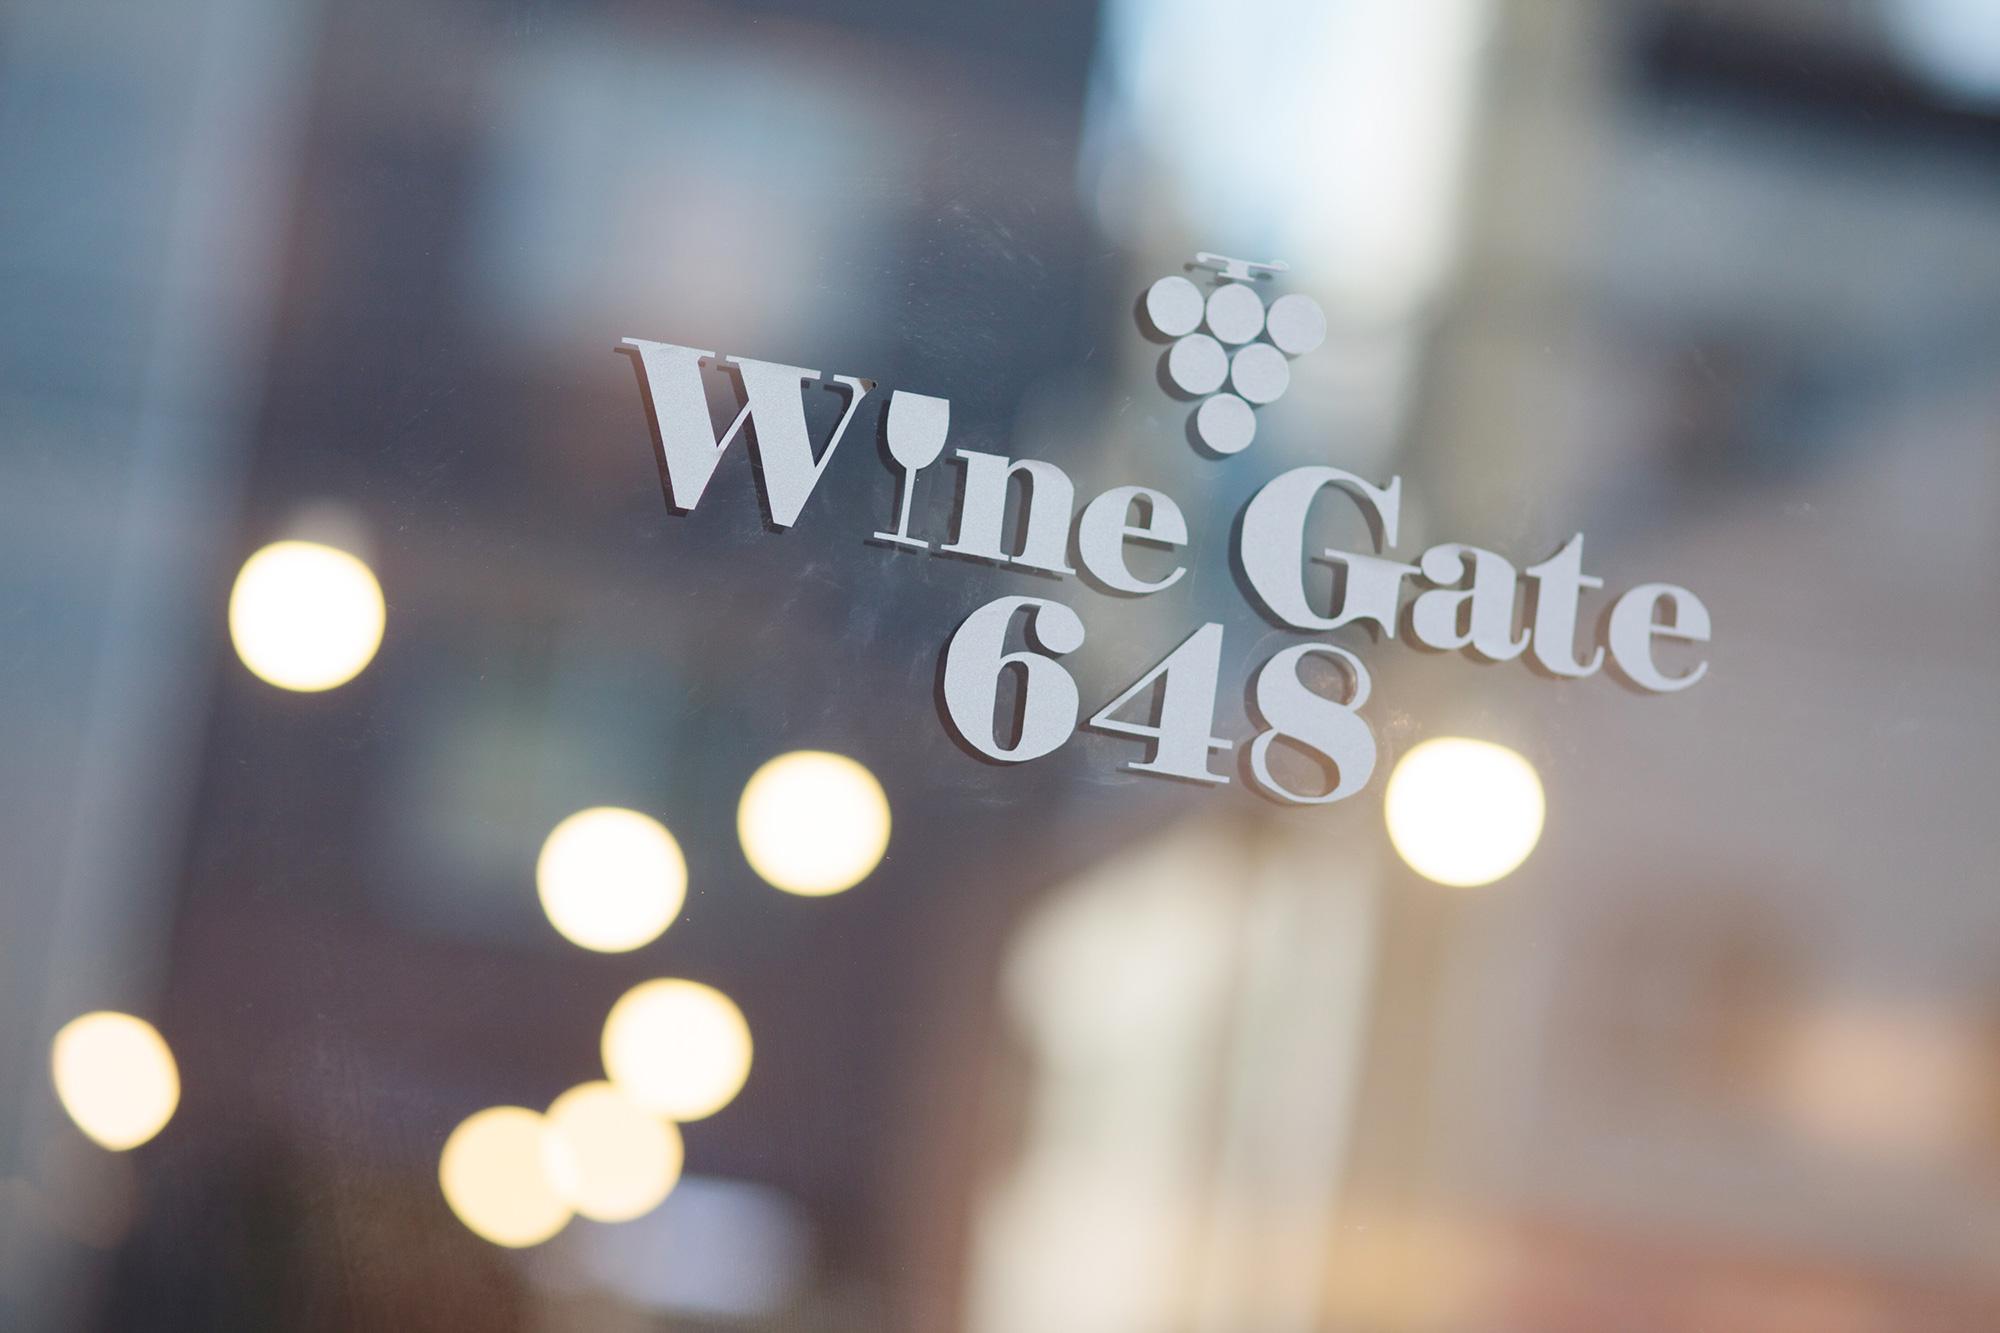 Wine Gate 648